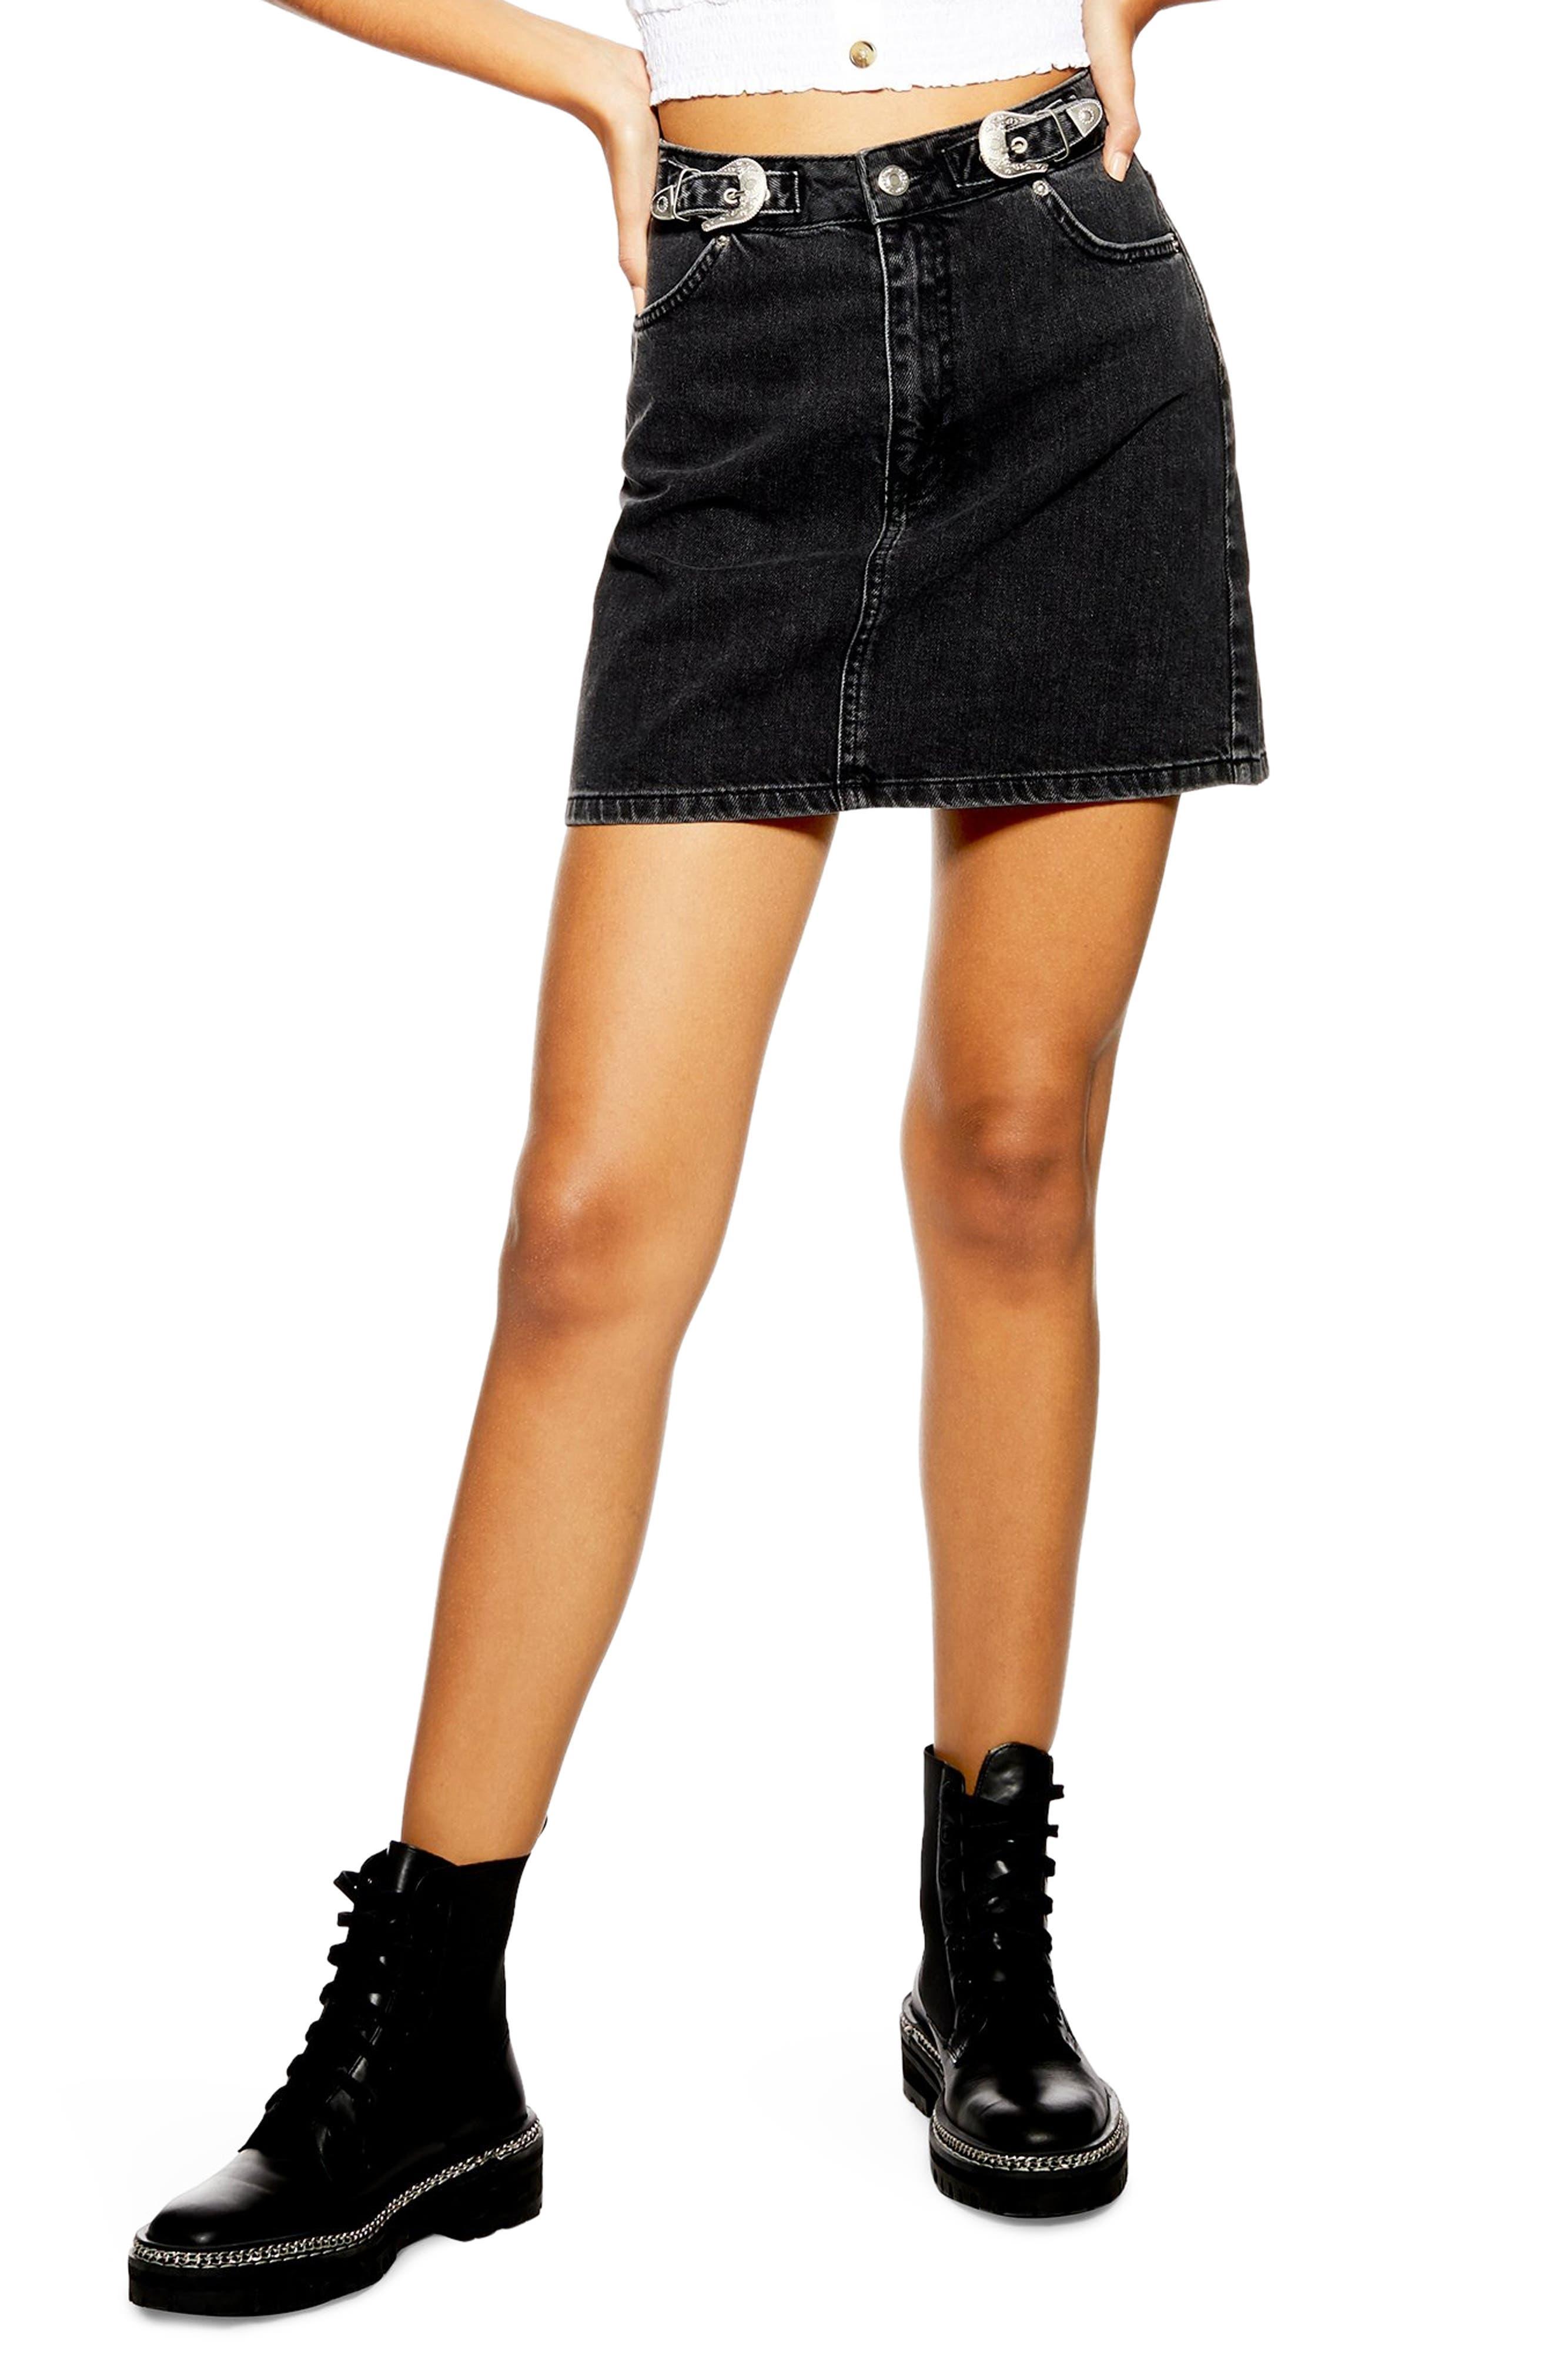 TOPSHOP, Buckle Denim Skirt, Main thumbnail 1, color, 002